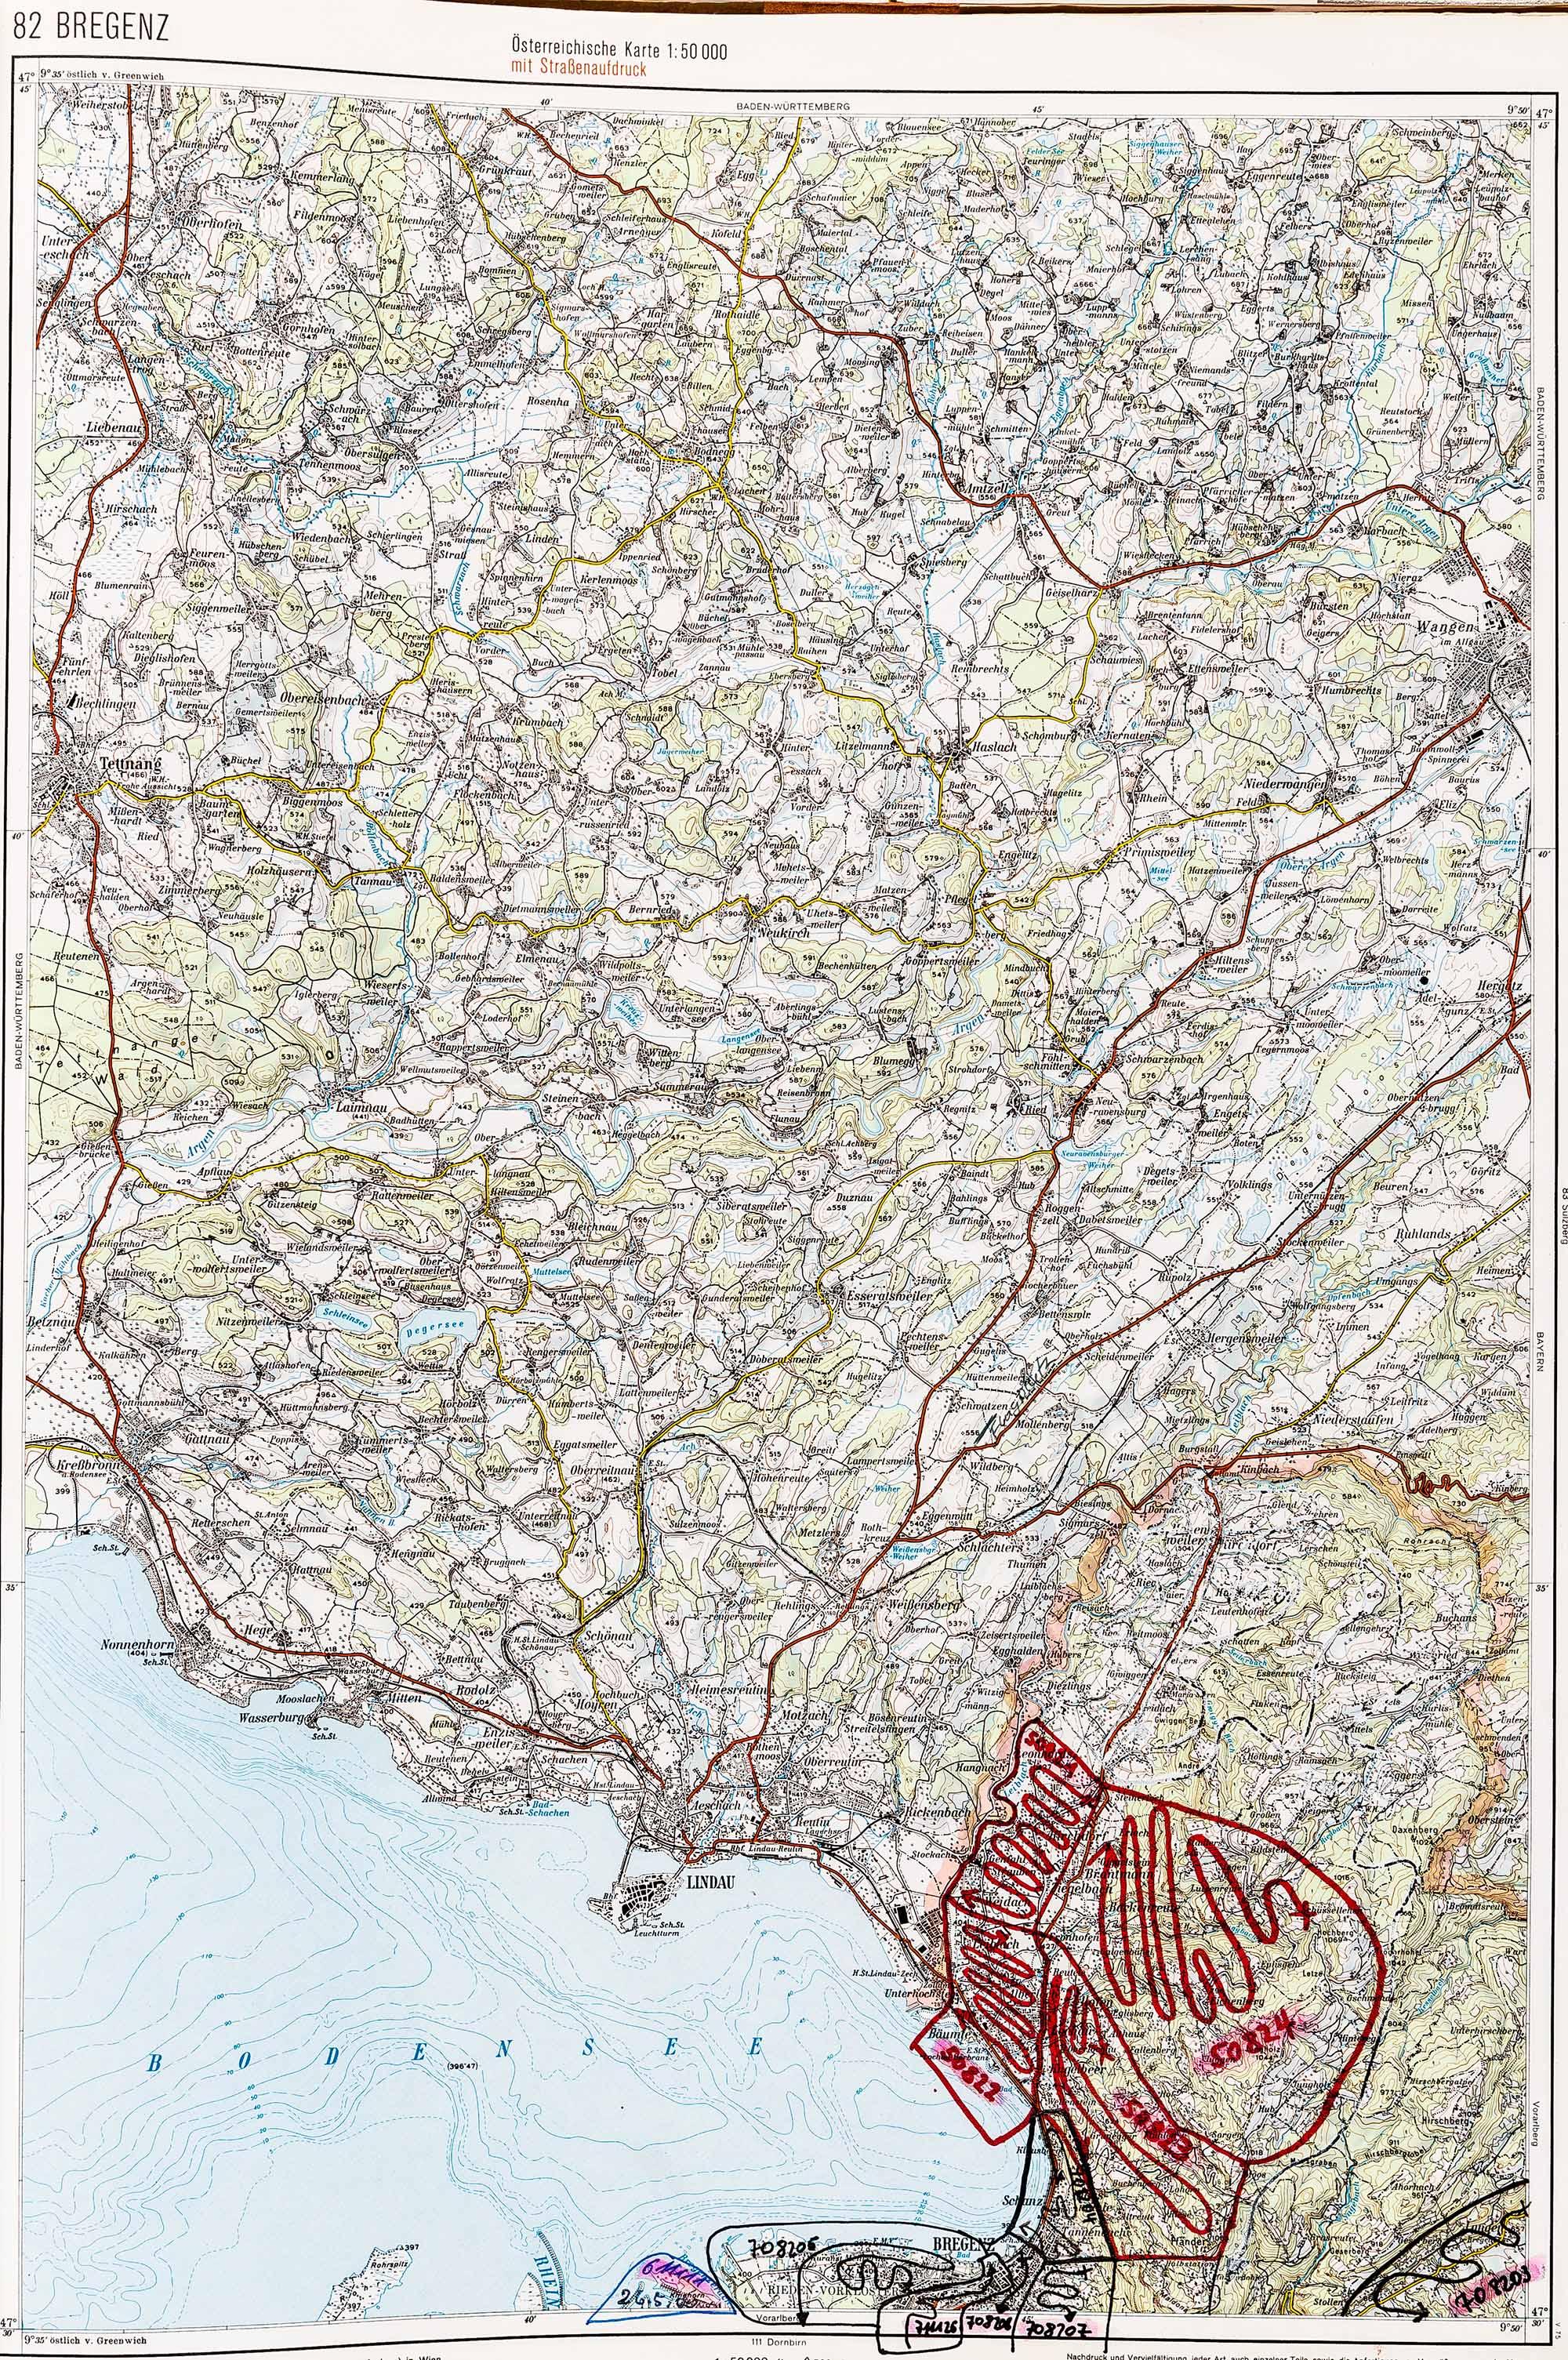 1975-1979 Karte 082